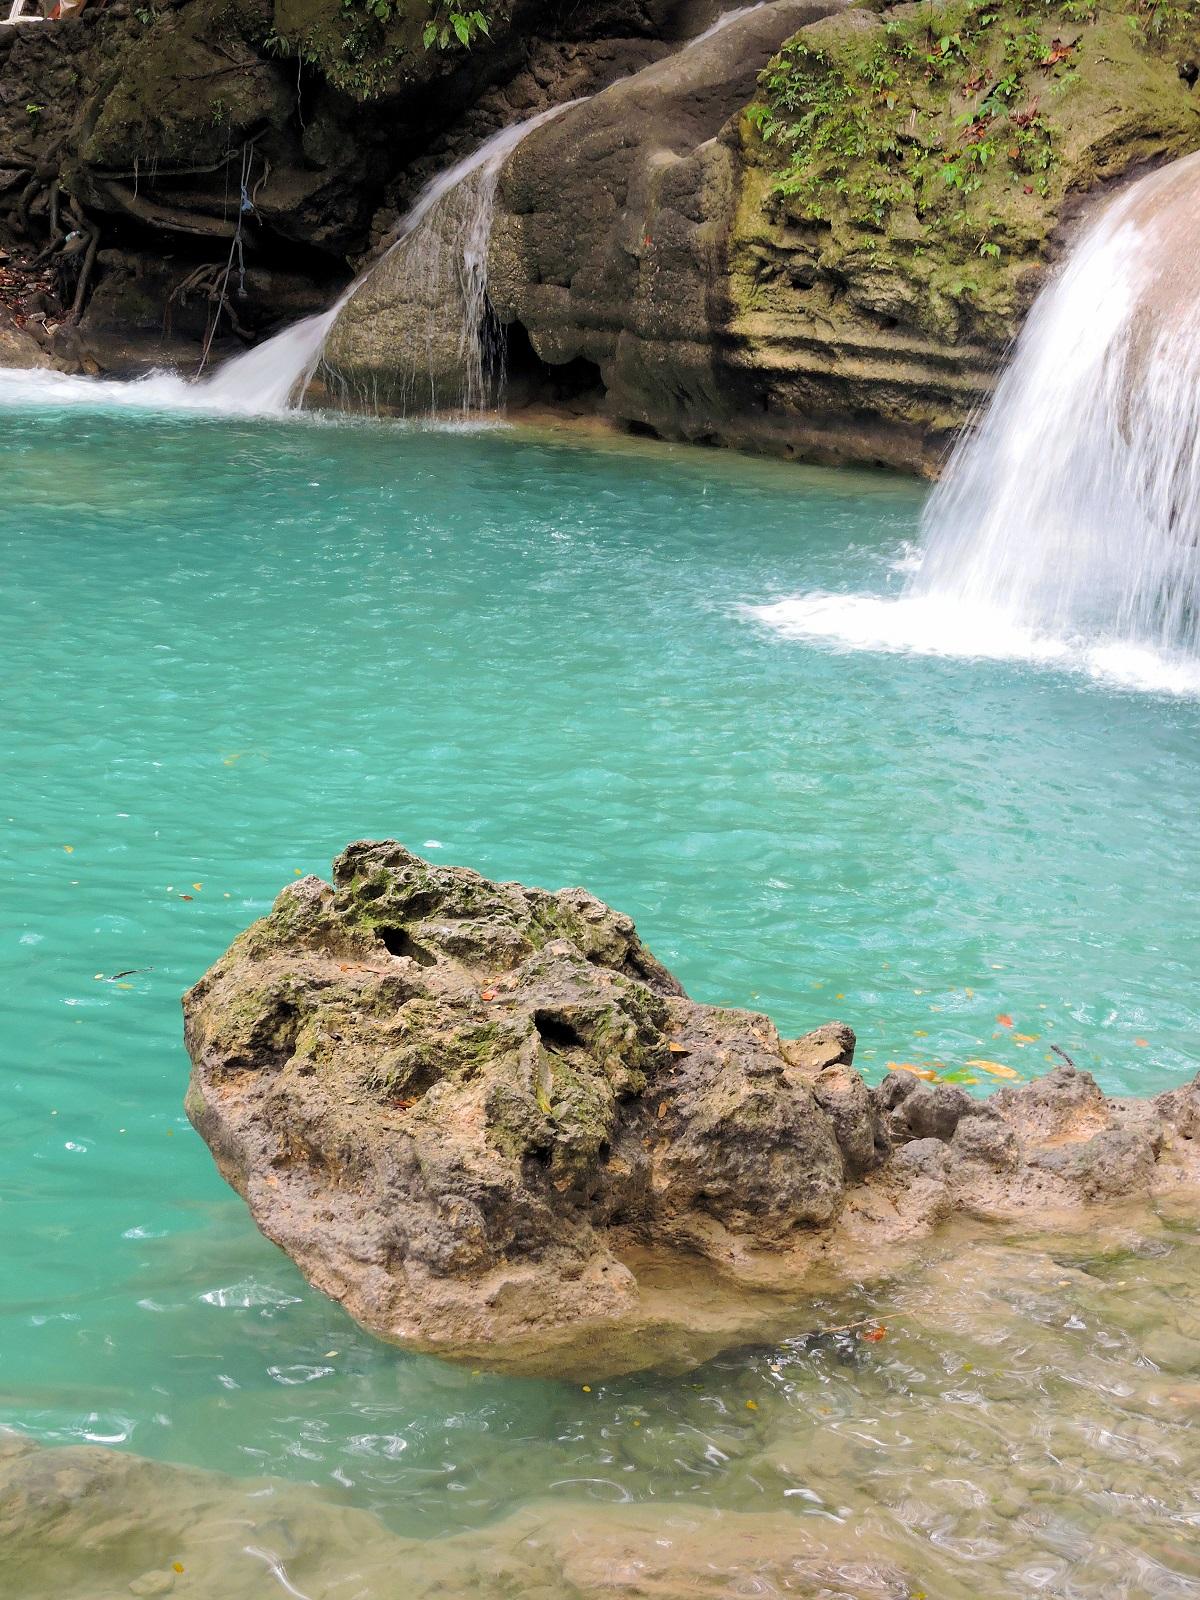 crazy blue pool of water upper falls Kawasan